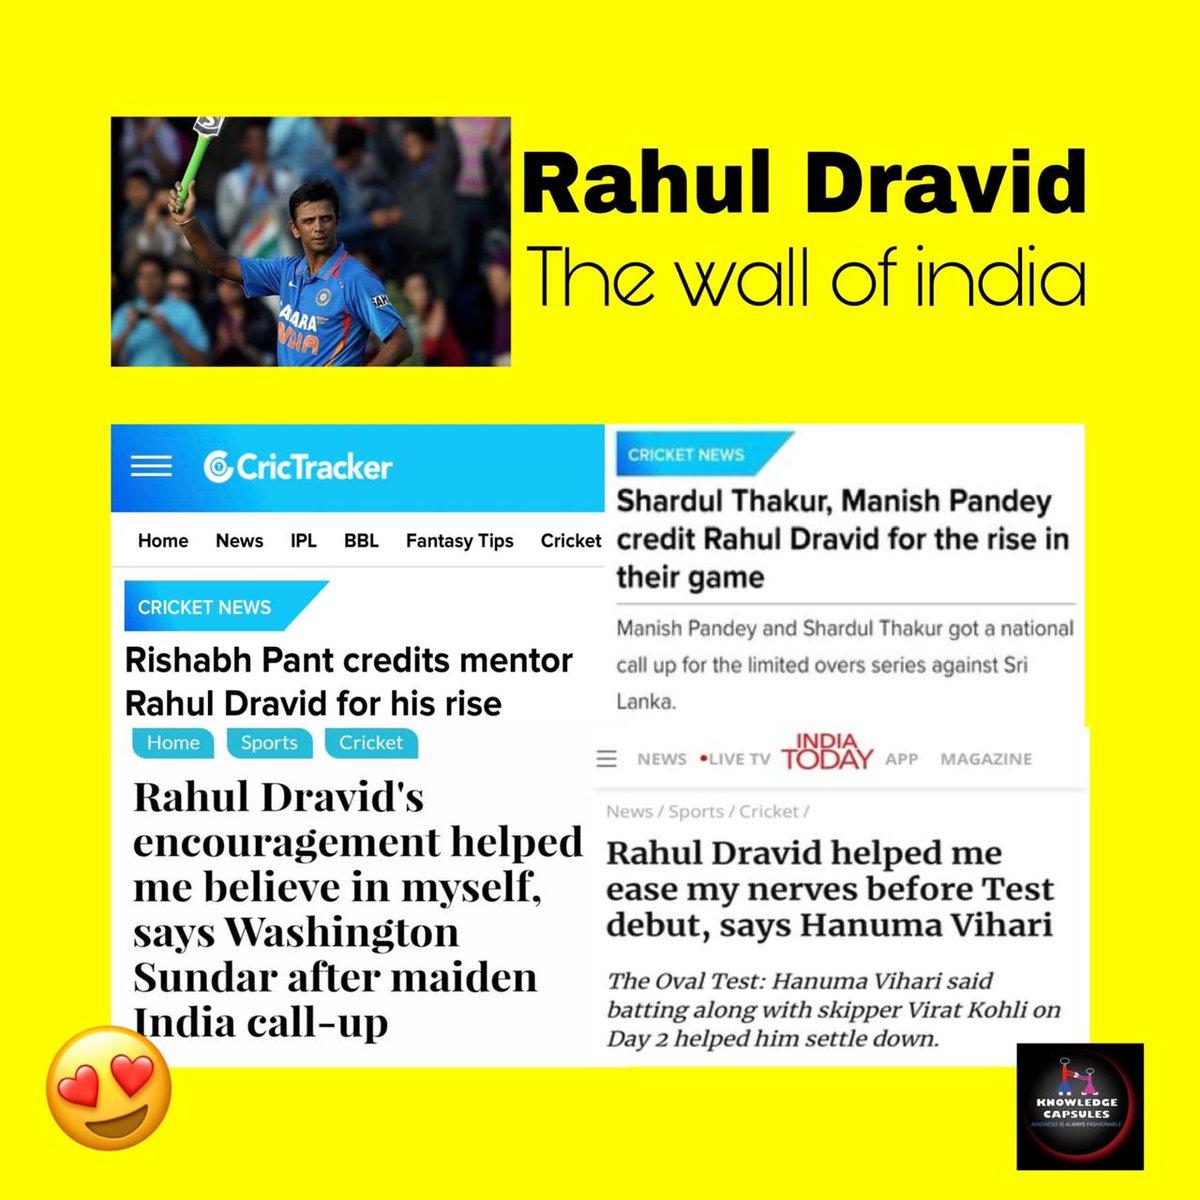 #INDvsAUS #AUSvINDtest #AUSvsIND #AUSvIND #INDvAUS #CongratulationsIndia #Gabba #IndianCricketTeam #tuesdaymotivations #Cricket #RahulDravid #RishabhPant #Washington #Washingtonsunder